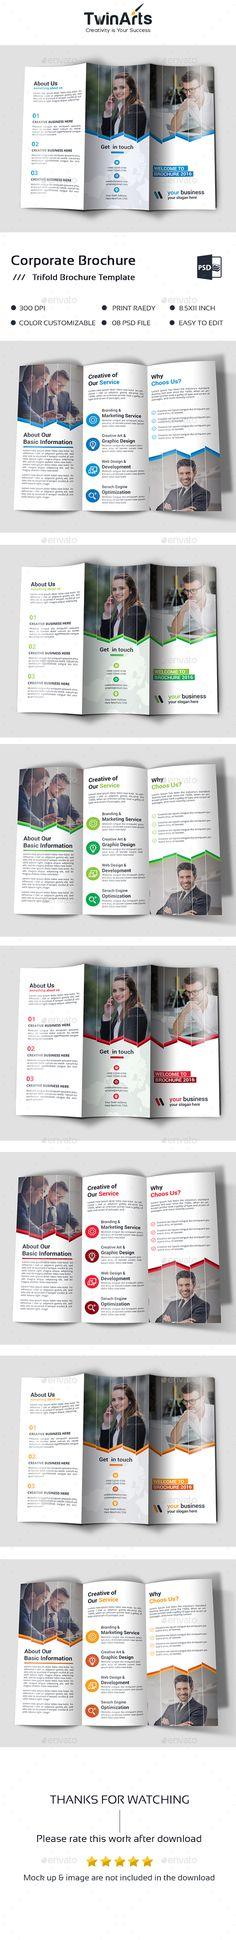 Tri-Fold Music Brochure Template Brochure template, Tri fold and - music brochure